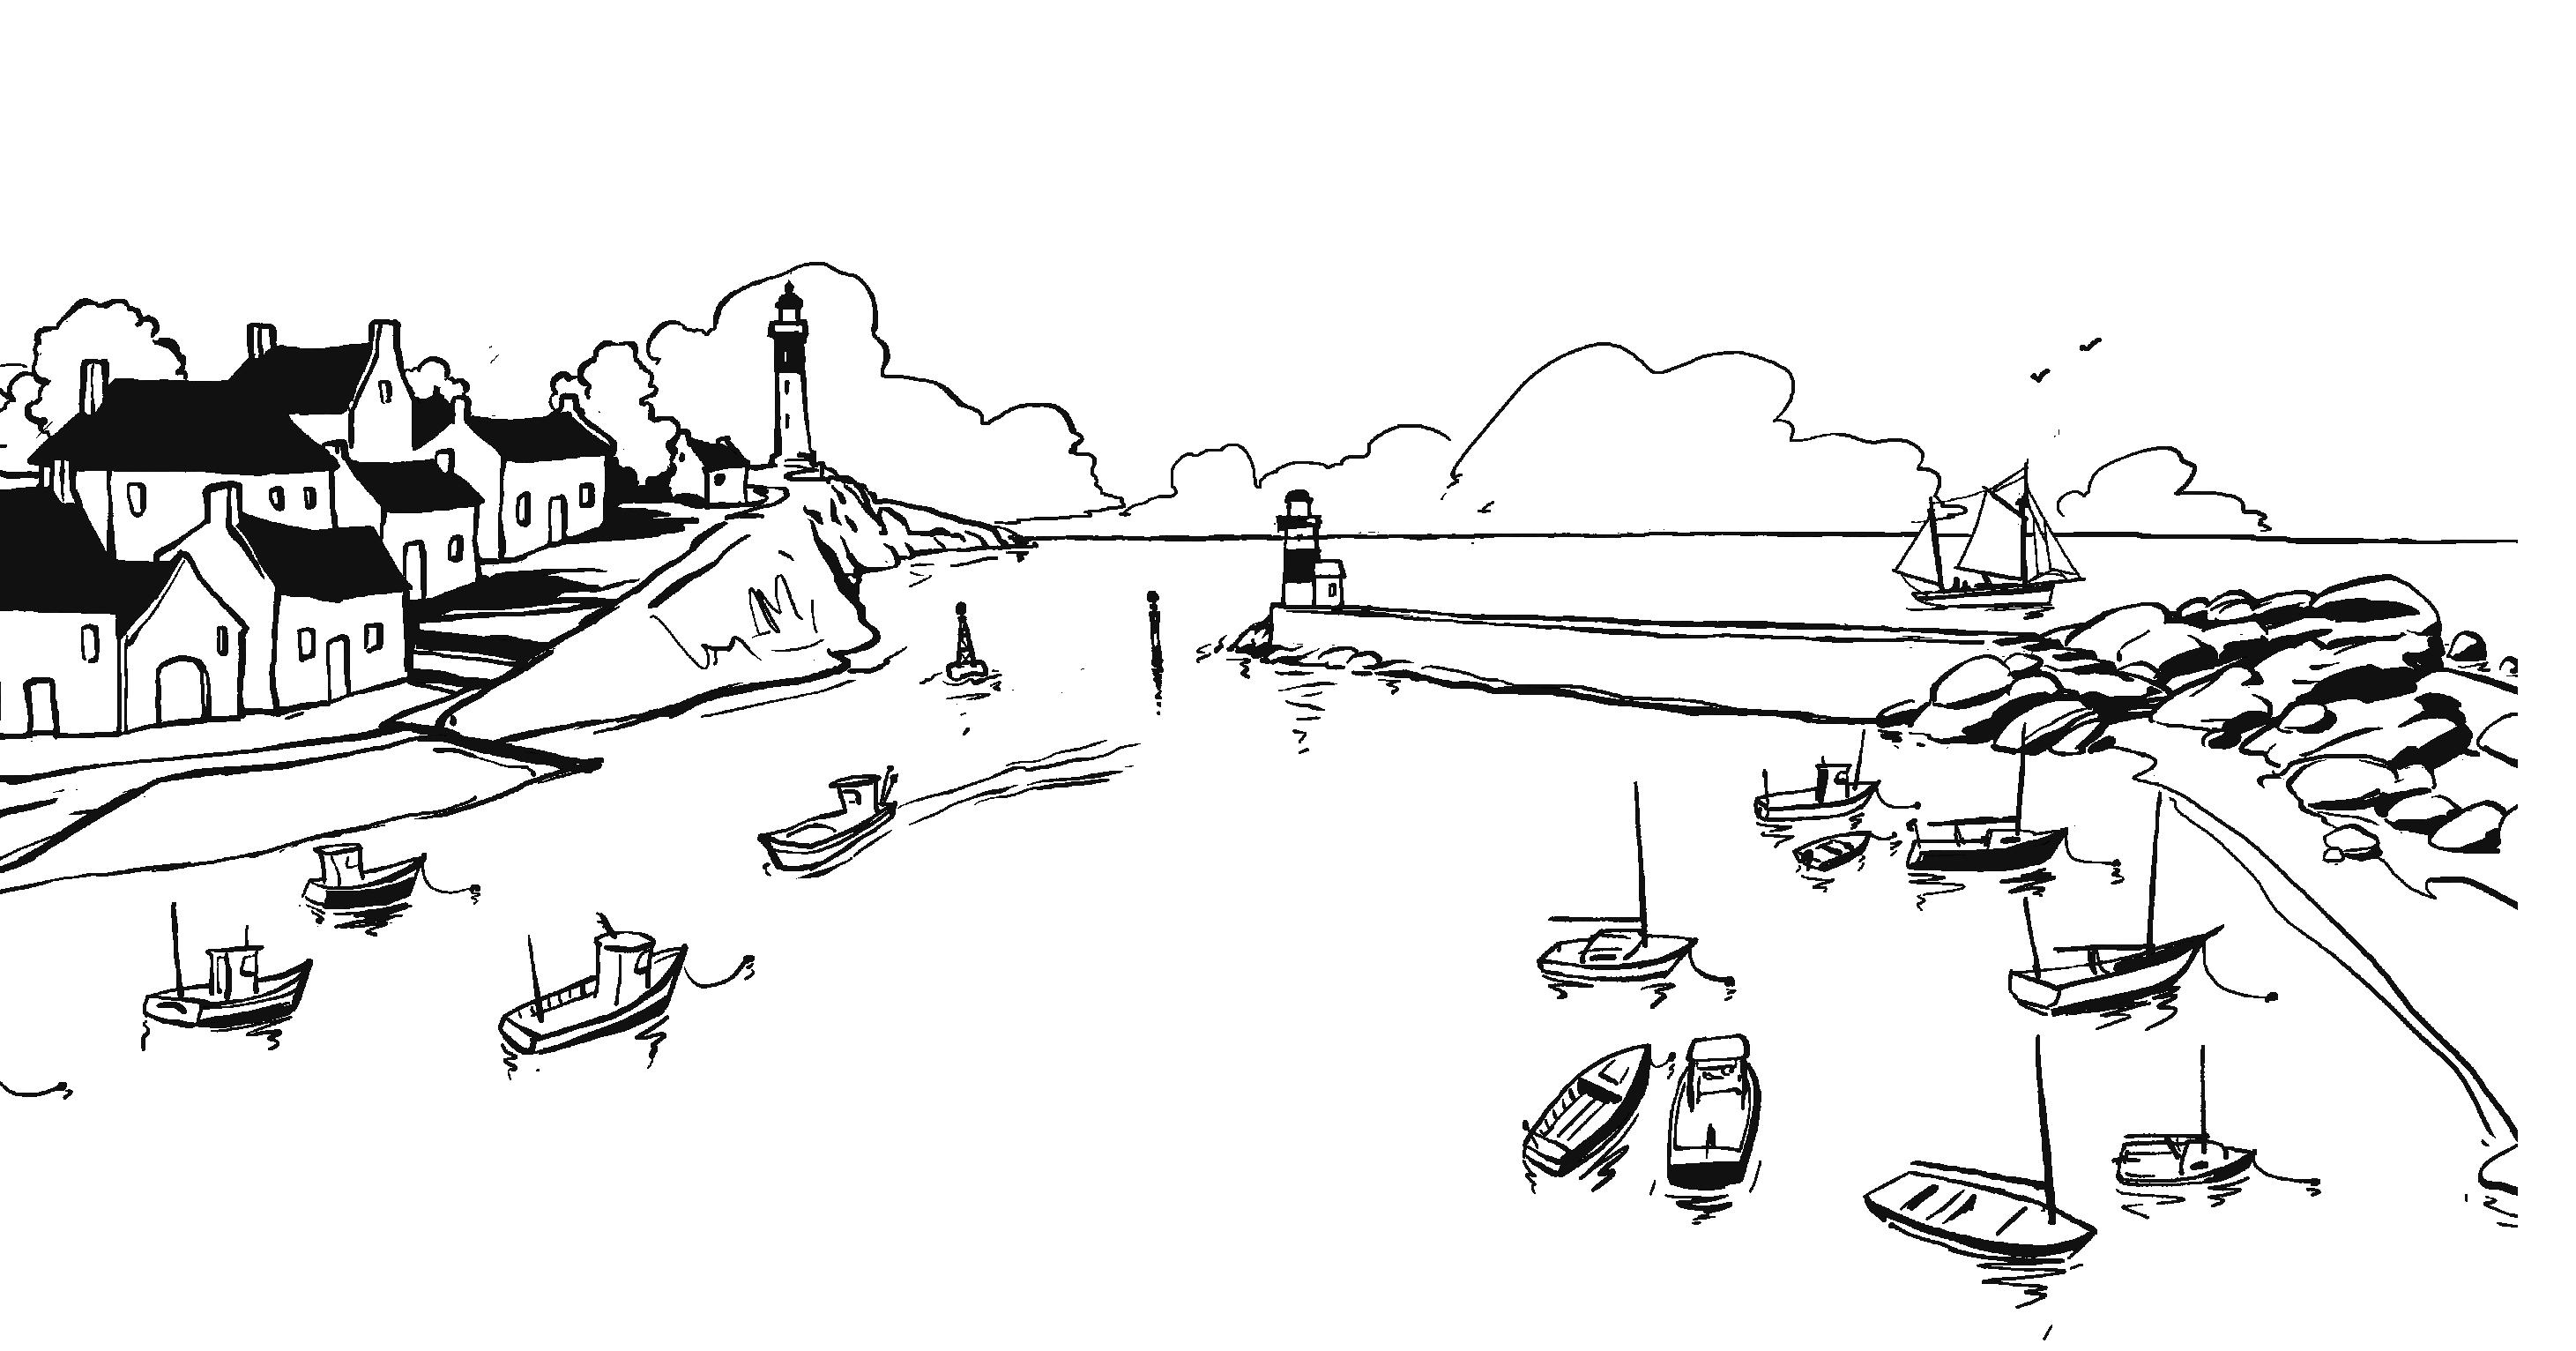 Plancoet illustration